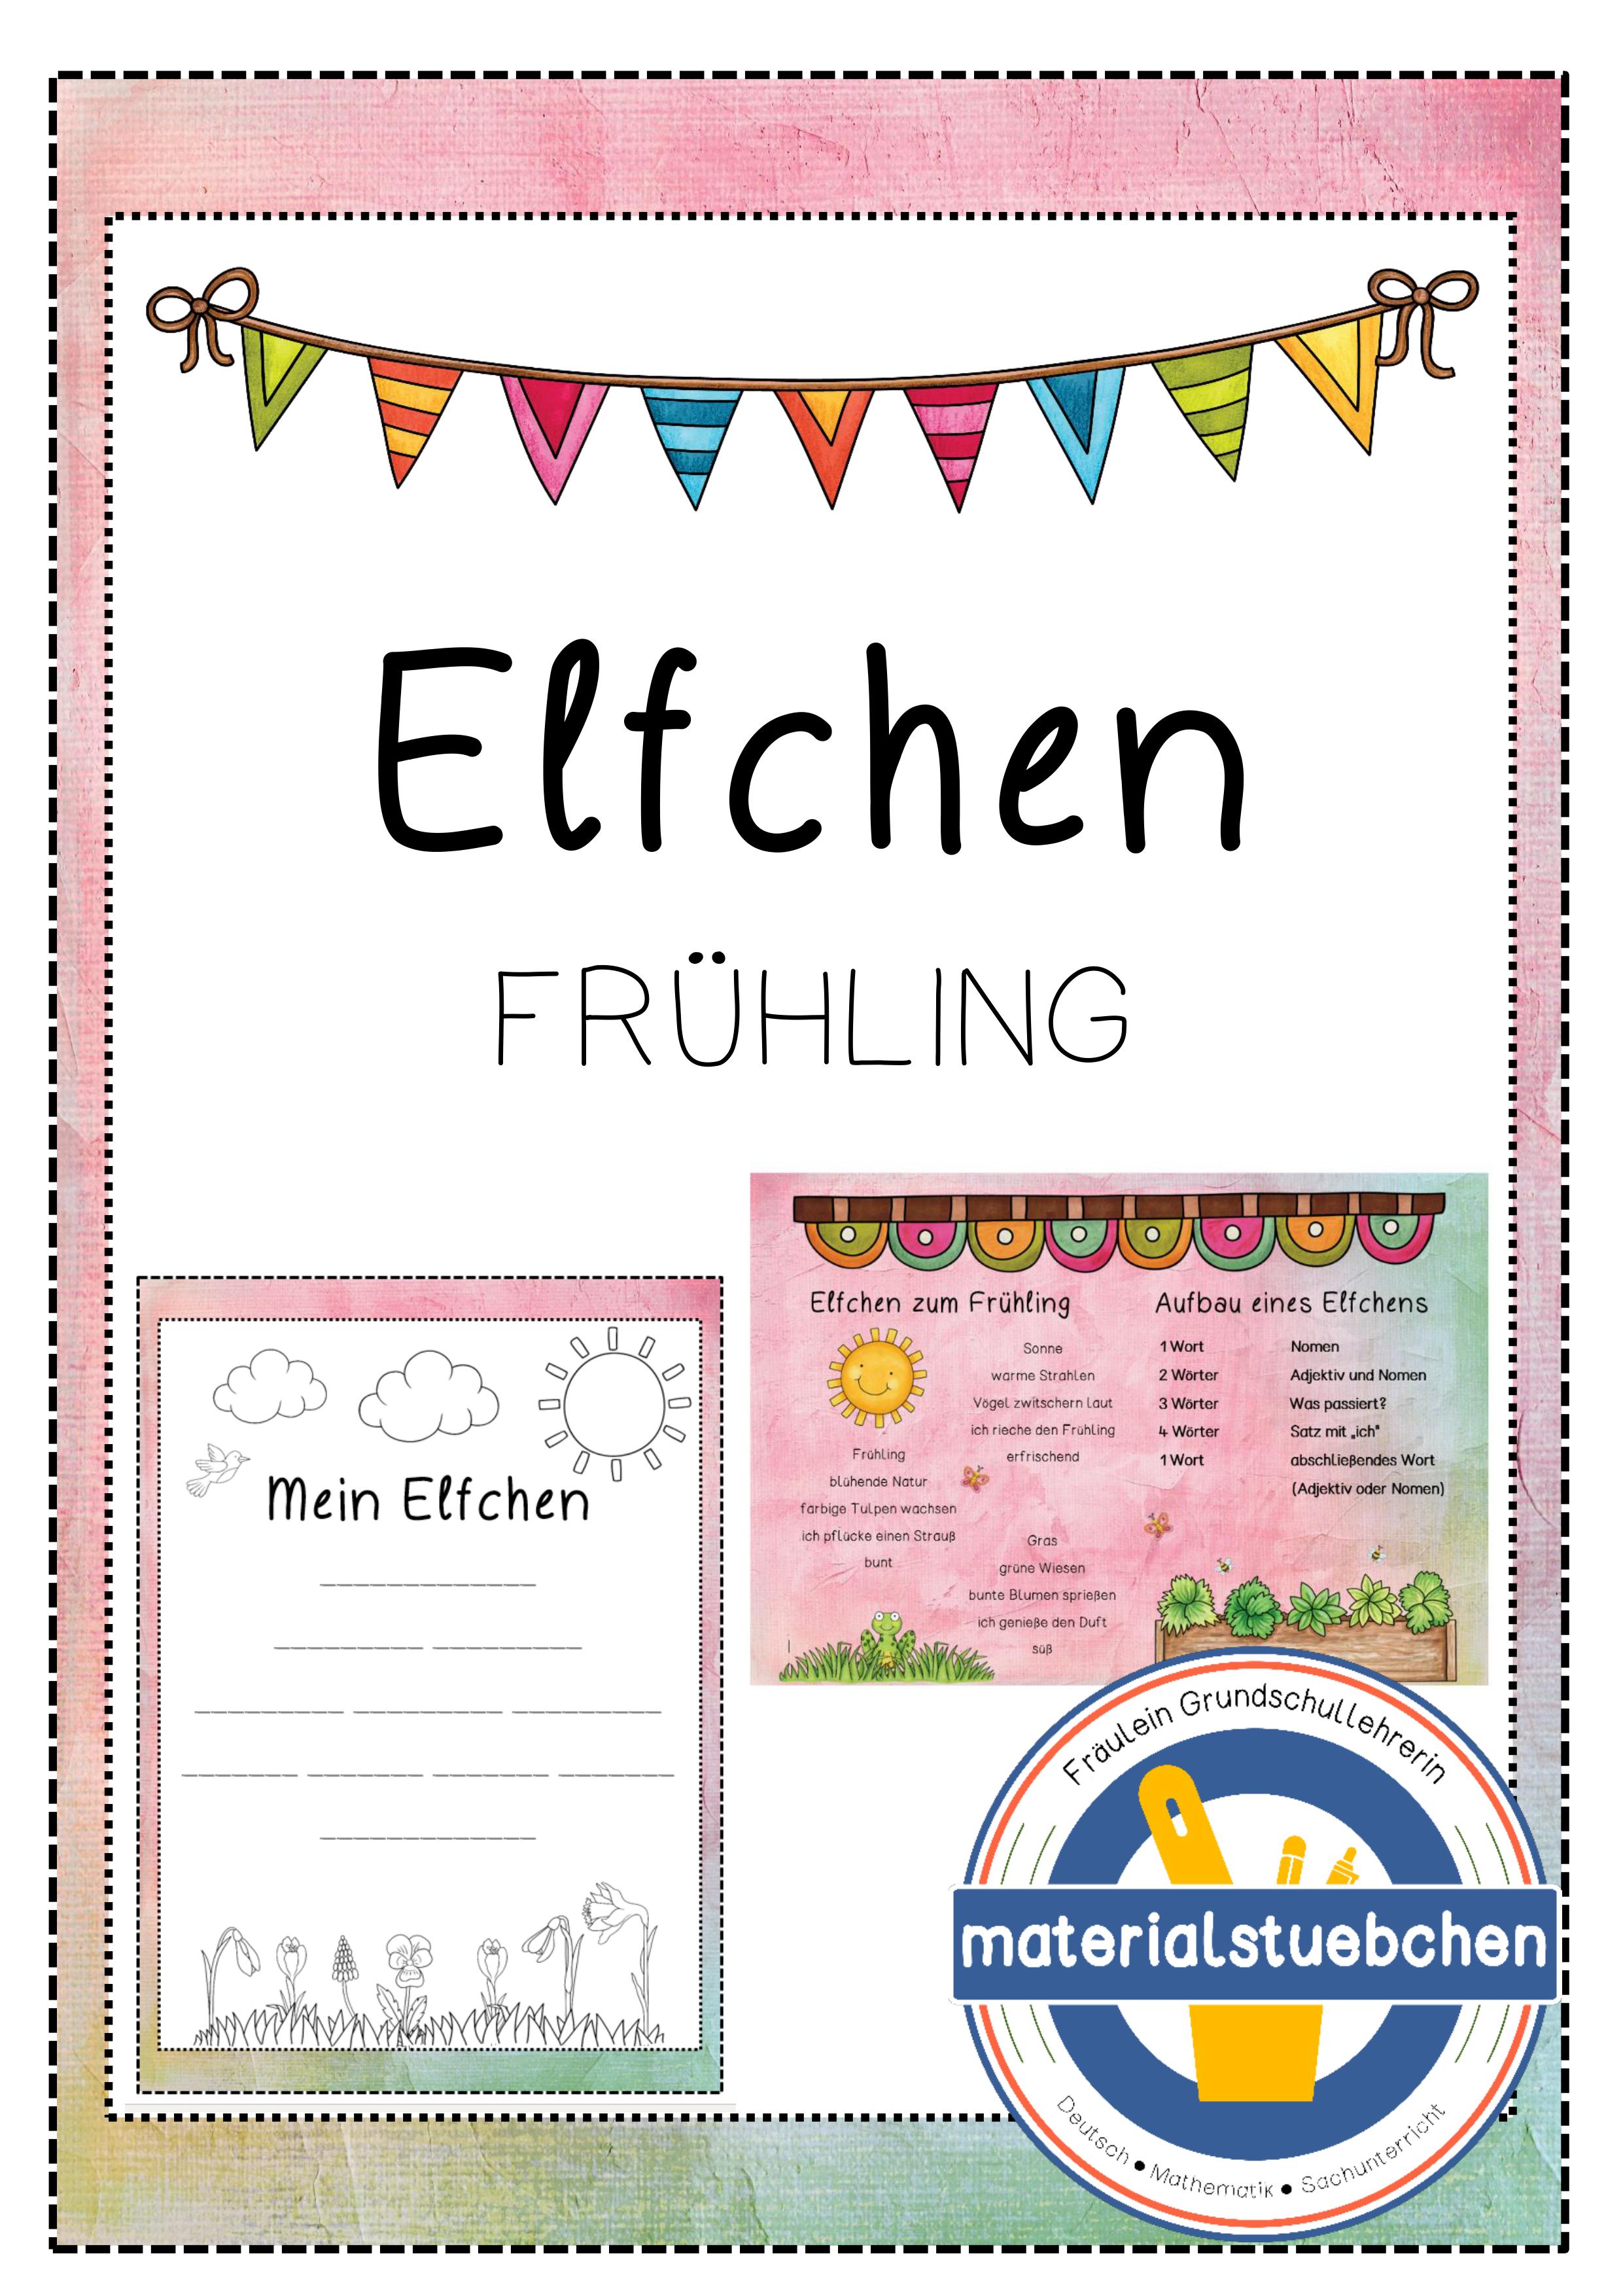 Elfchen Zum Fruhling Ideal Fur Homeschooling Unterrichtsmaterial In Den Fachern Deutsch Fachubergreifendes Elfchen Unterrichtsmaterial Bildung